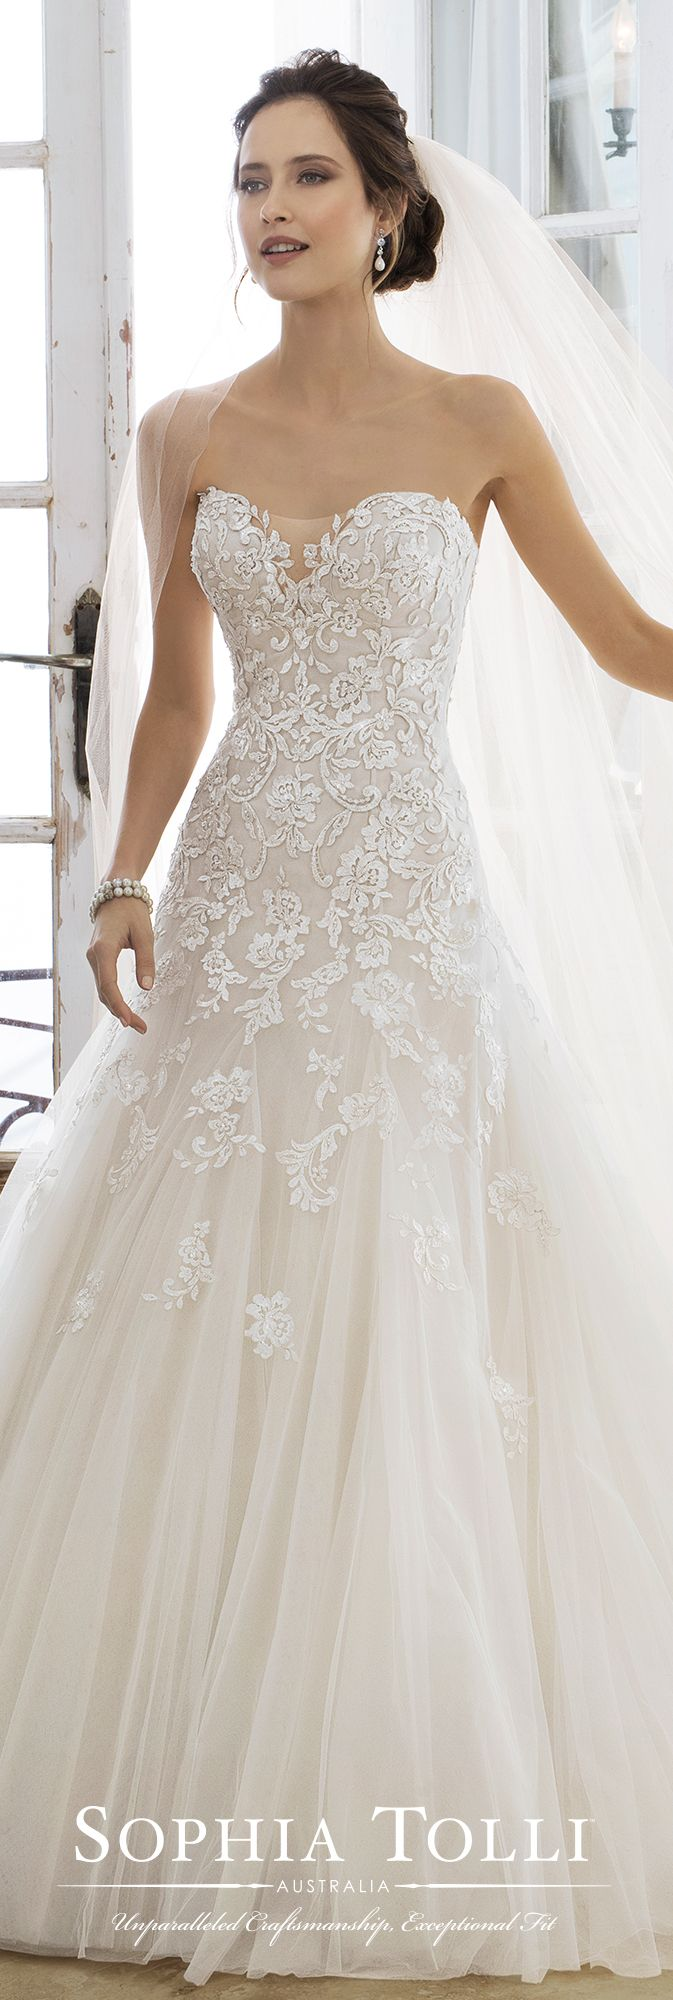 Strapless Dropped Waist Lace Fairytale Wedding Dress – Y11866 Adonia